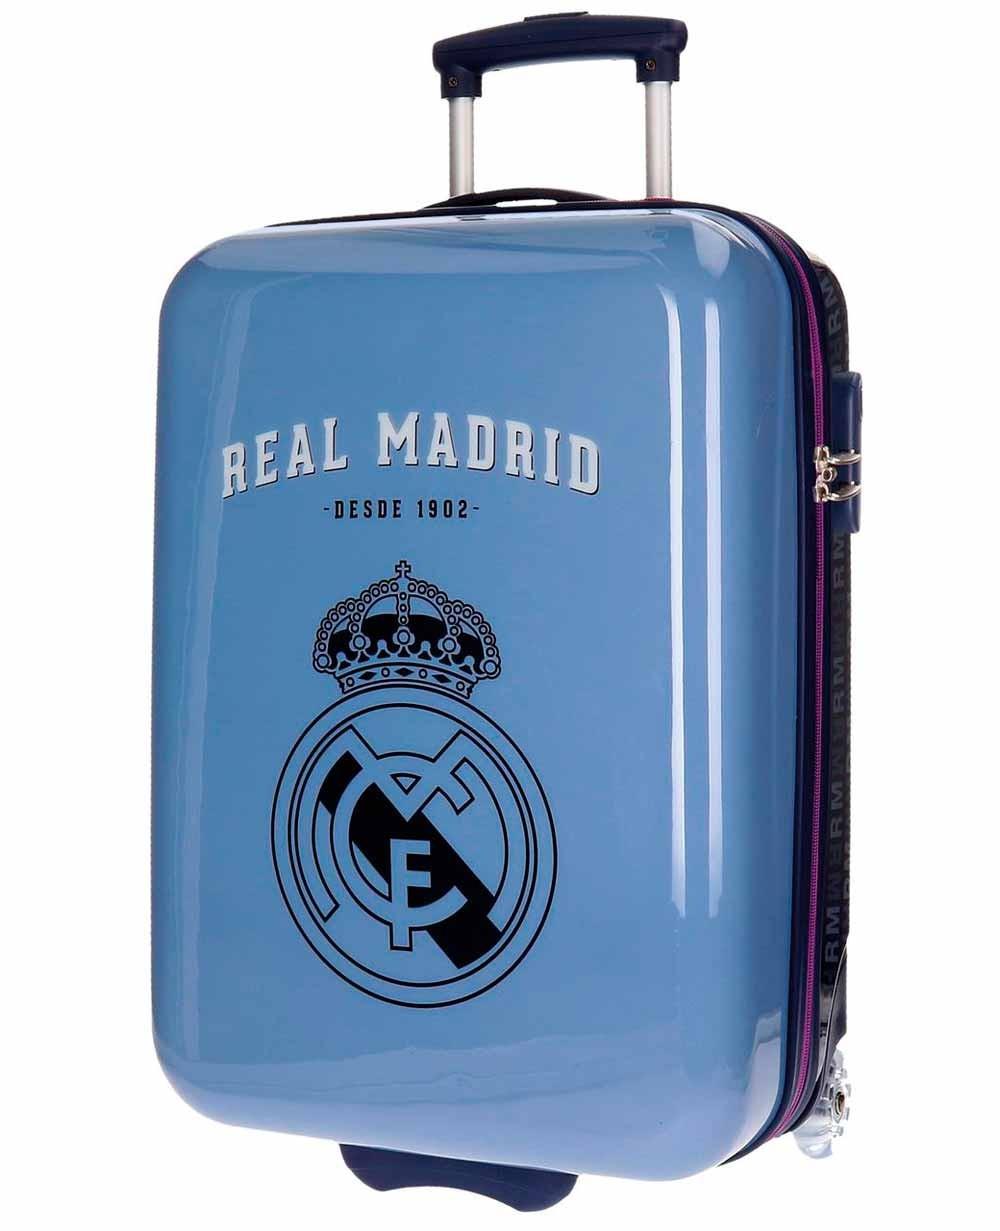 Real Madrid Hala Madrid Maleta de mano Azul (Foto )